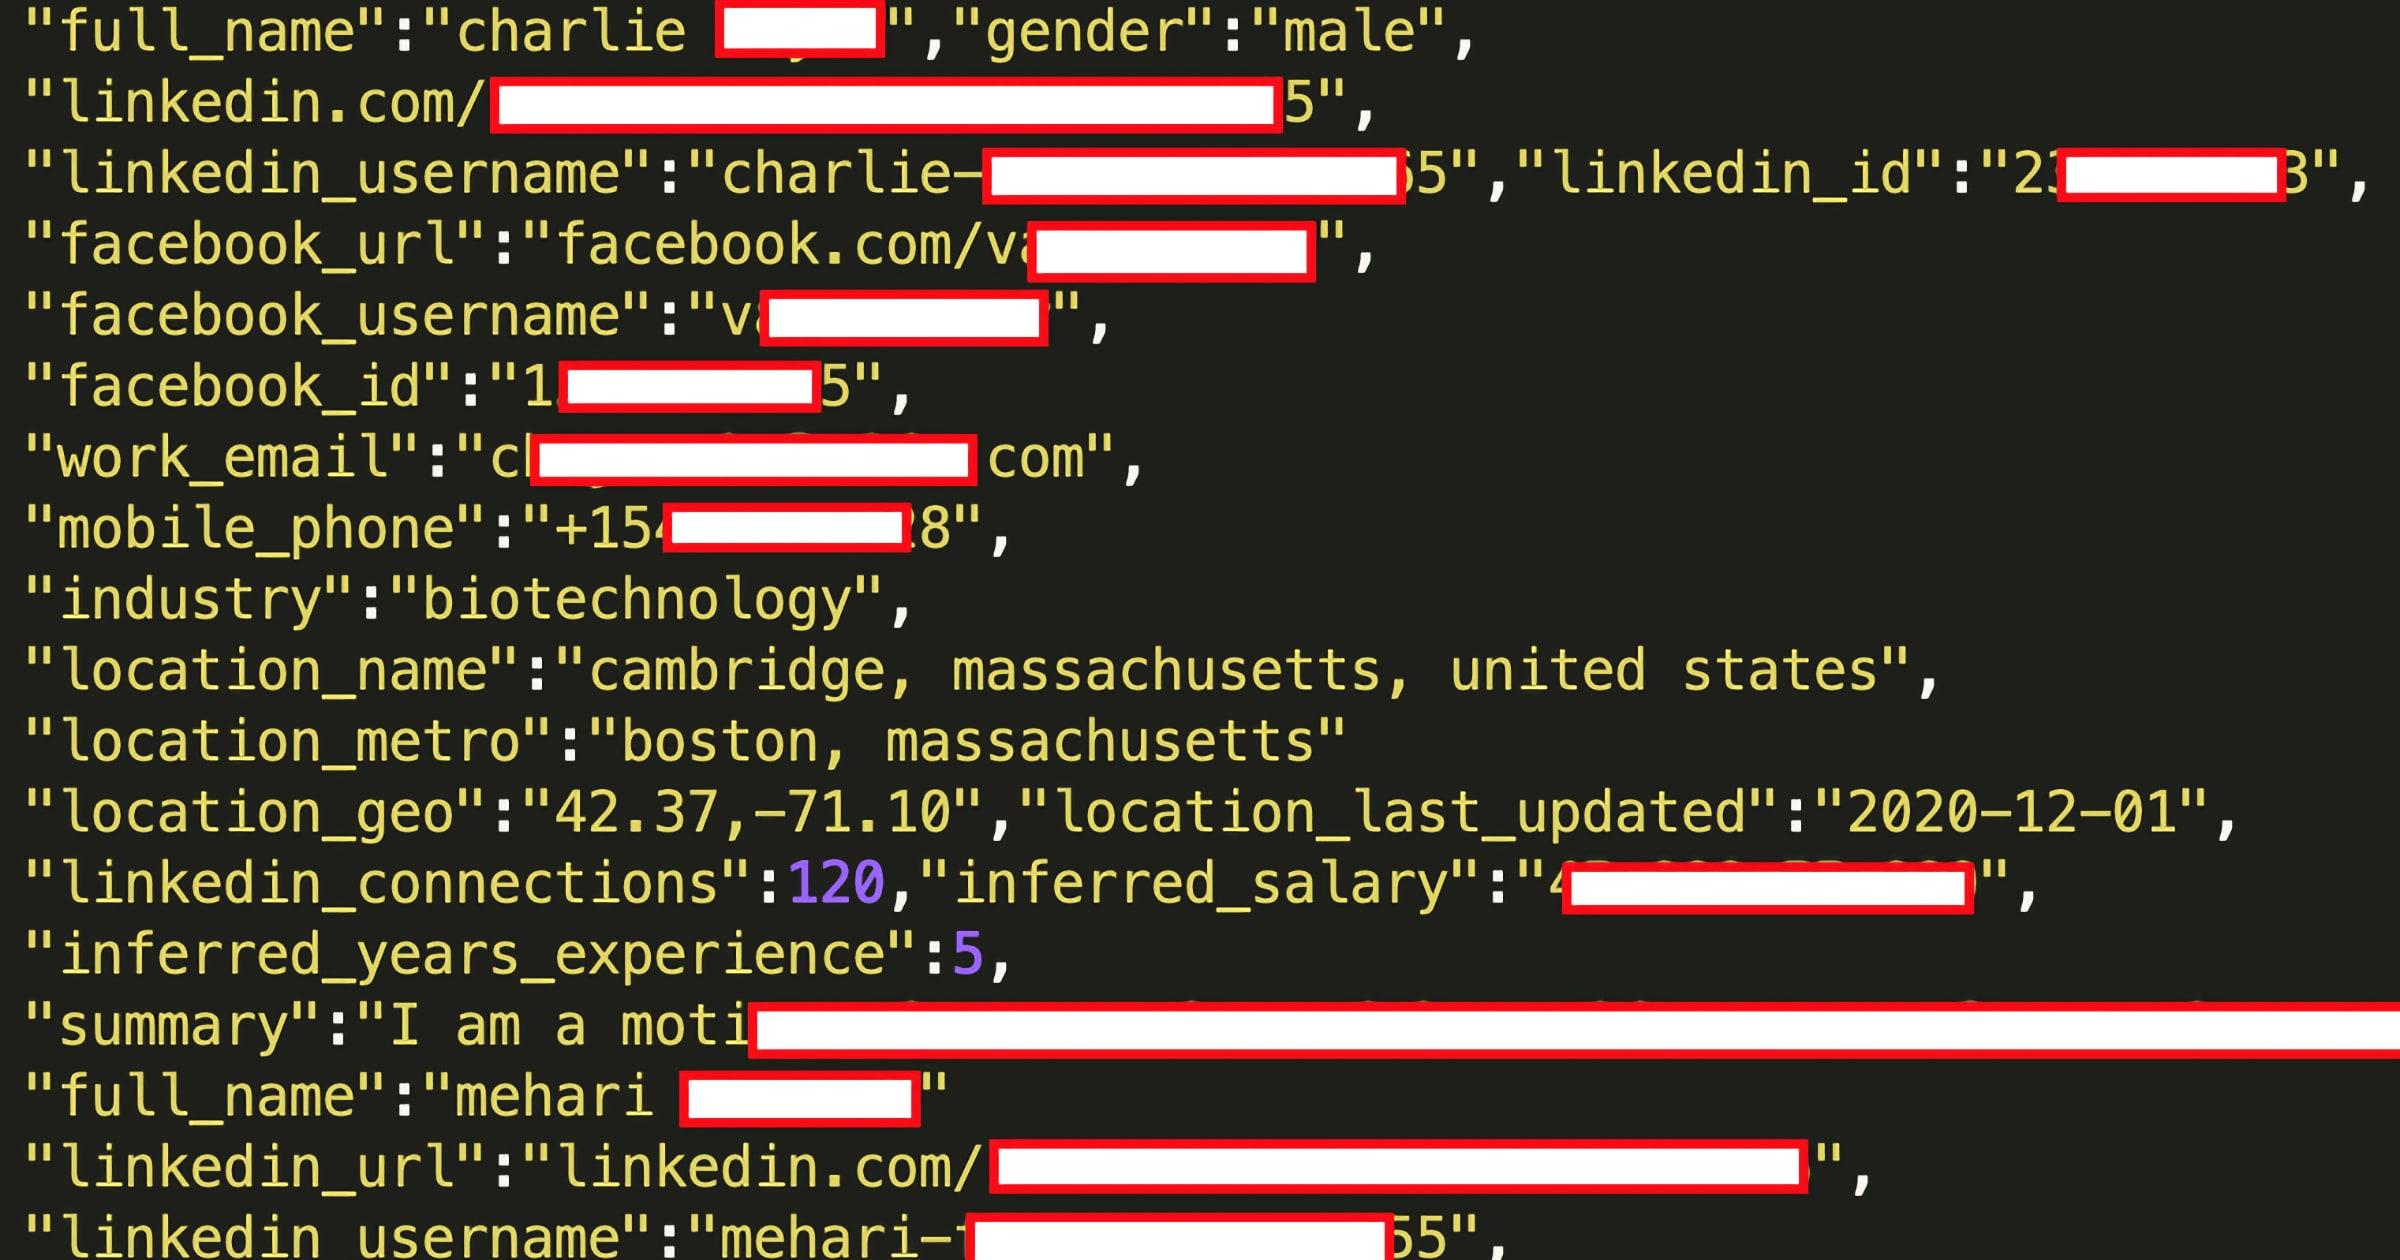 linkedin data leak